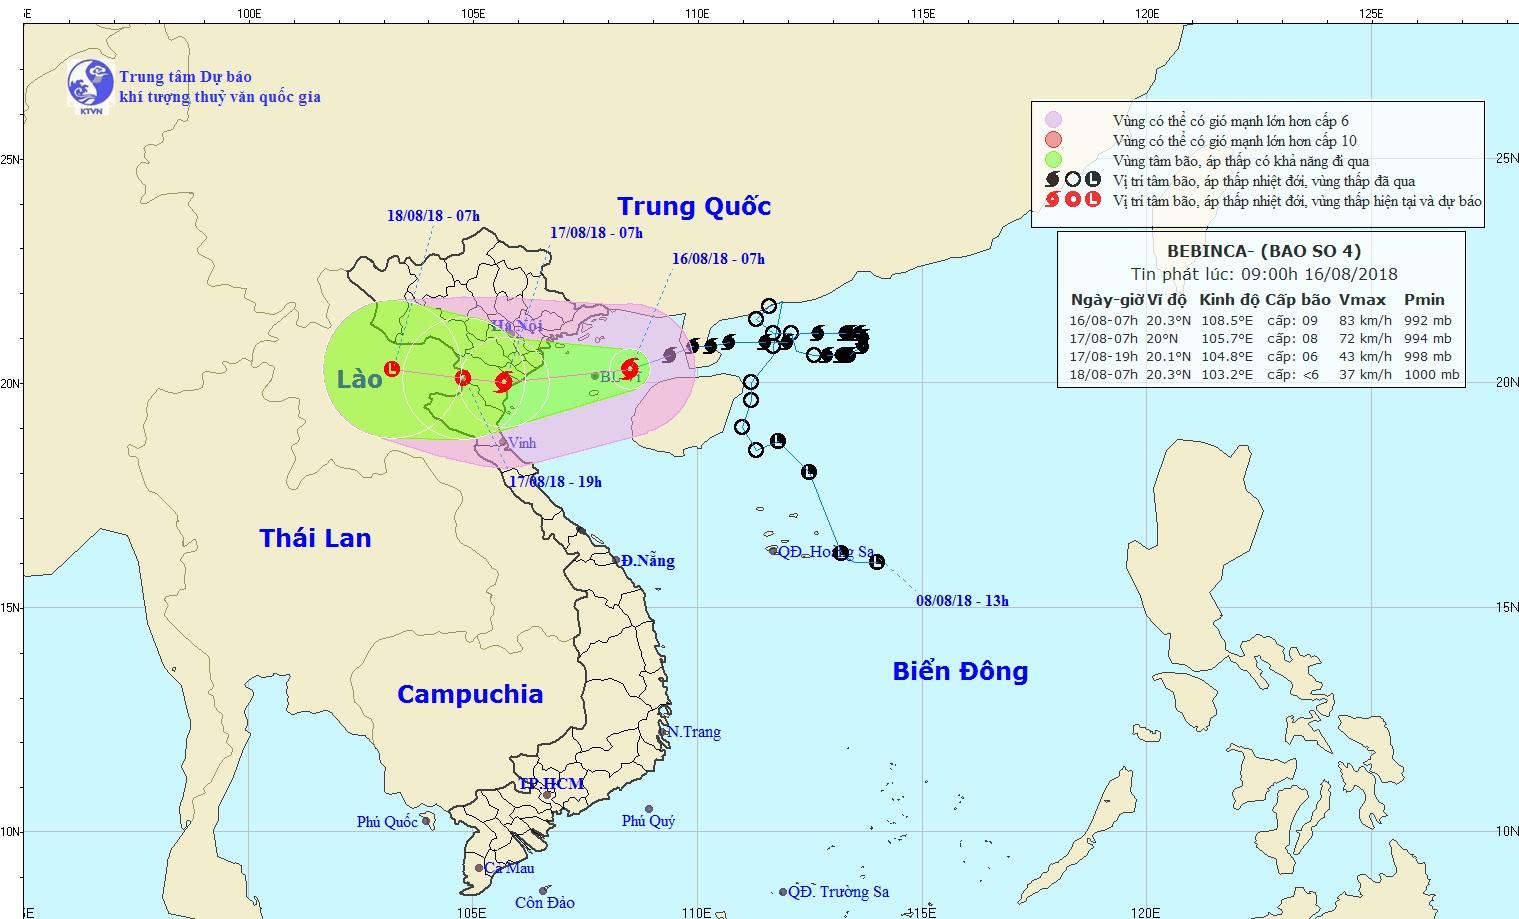 Storm Bebinca to bring rainfall, flooding to northern Vietnam this week